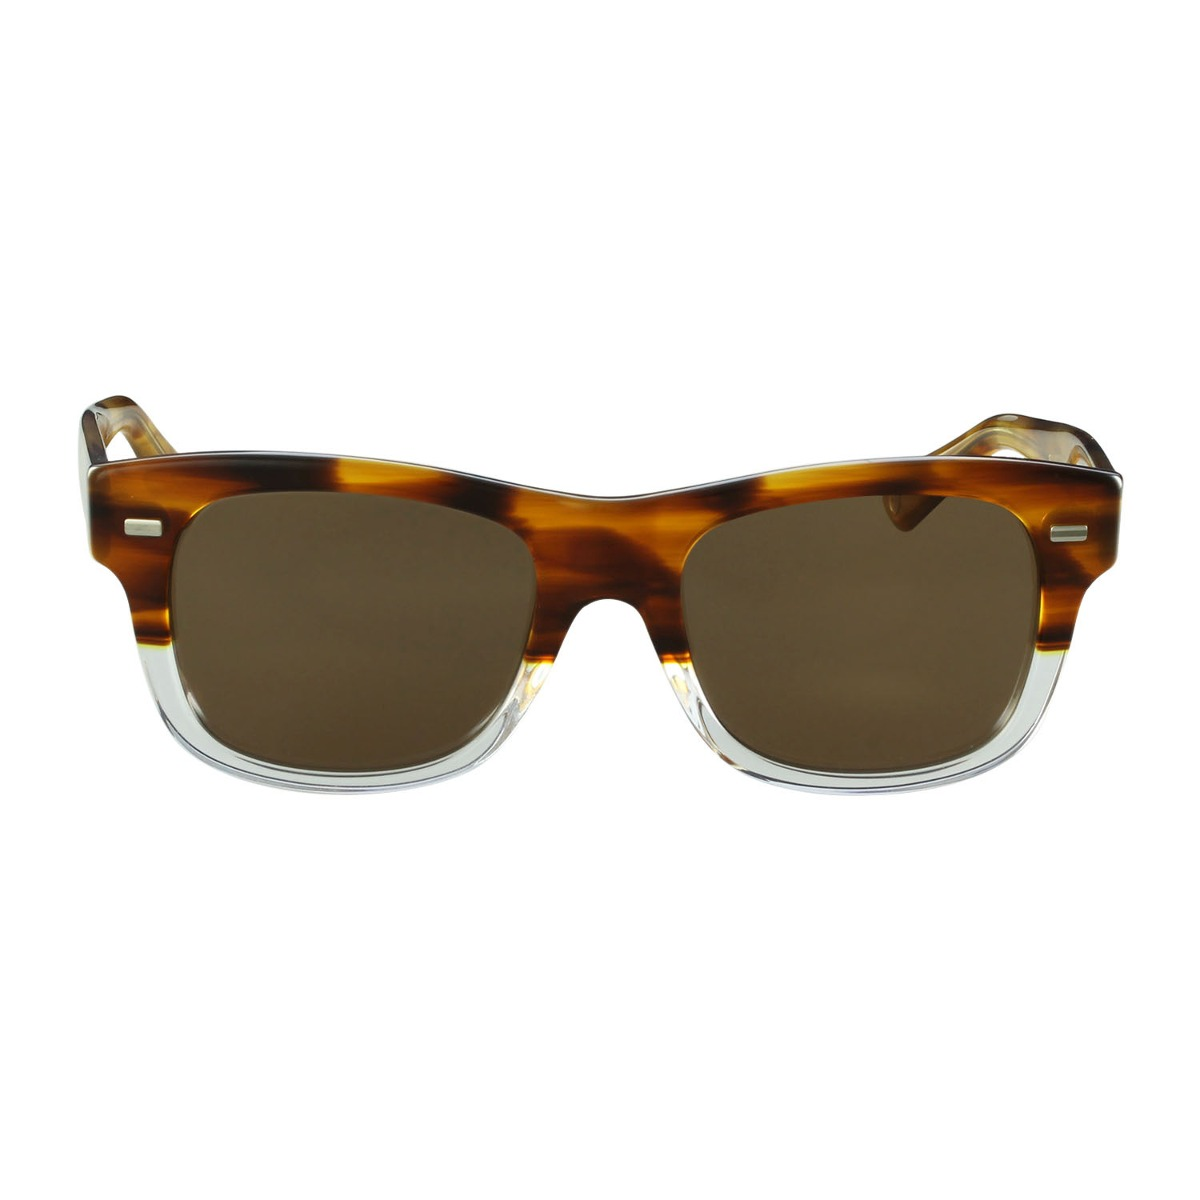 3f490d18e0339 Óculos De Sol Unissex Gucci Fashion Marrom - R  990,00 em Mercado Livre